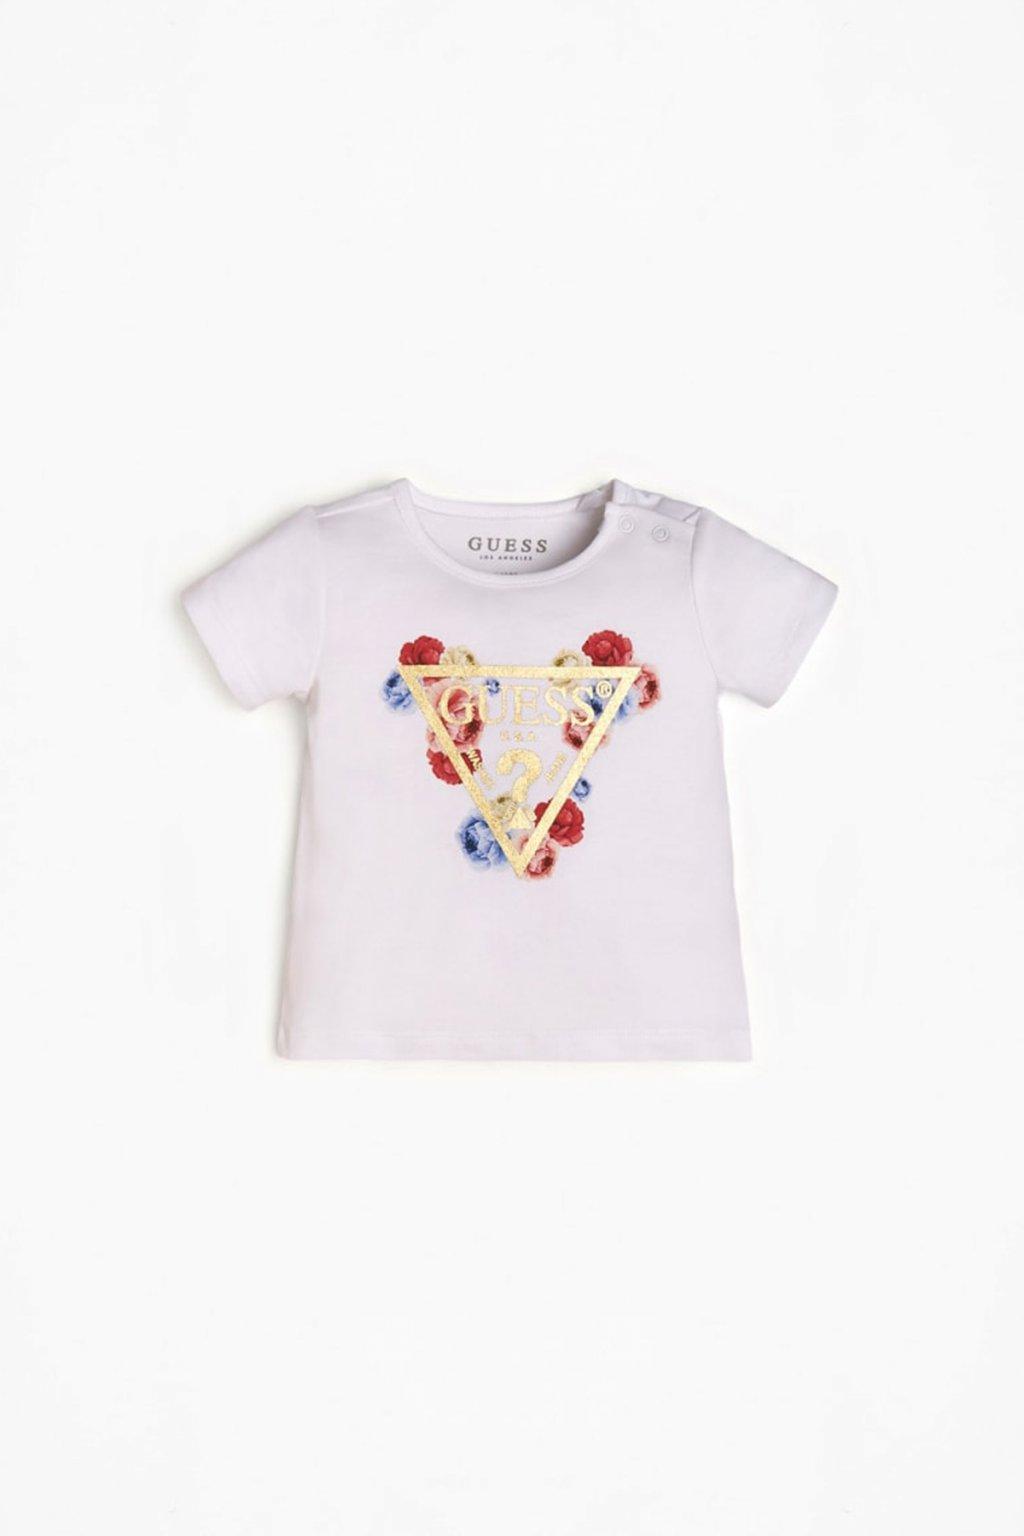 "Guess - Dívčí tričko ""FLOWERSHEARTH"" (Barva Bílá, Velikost 68)"